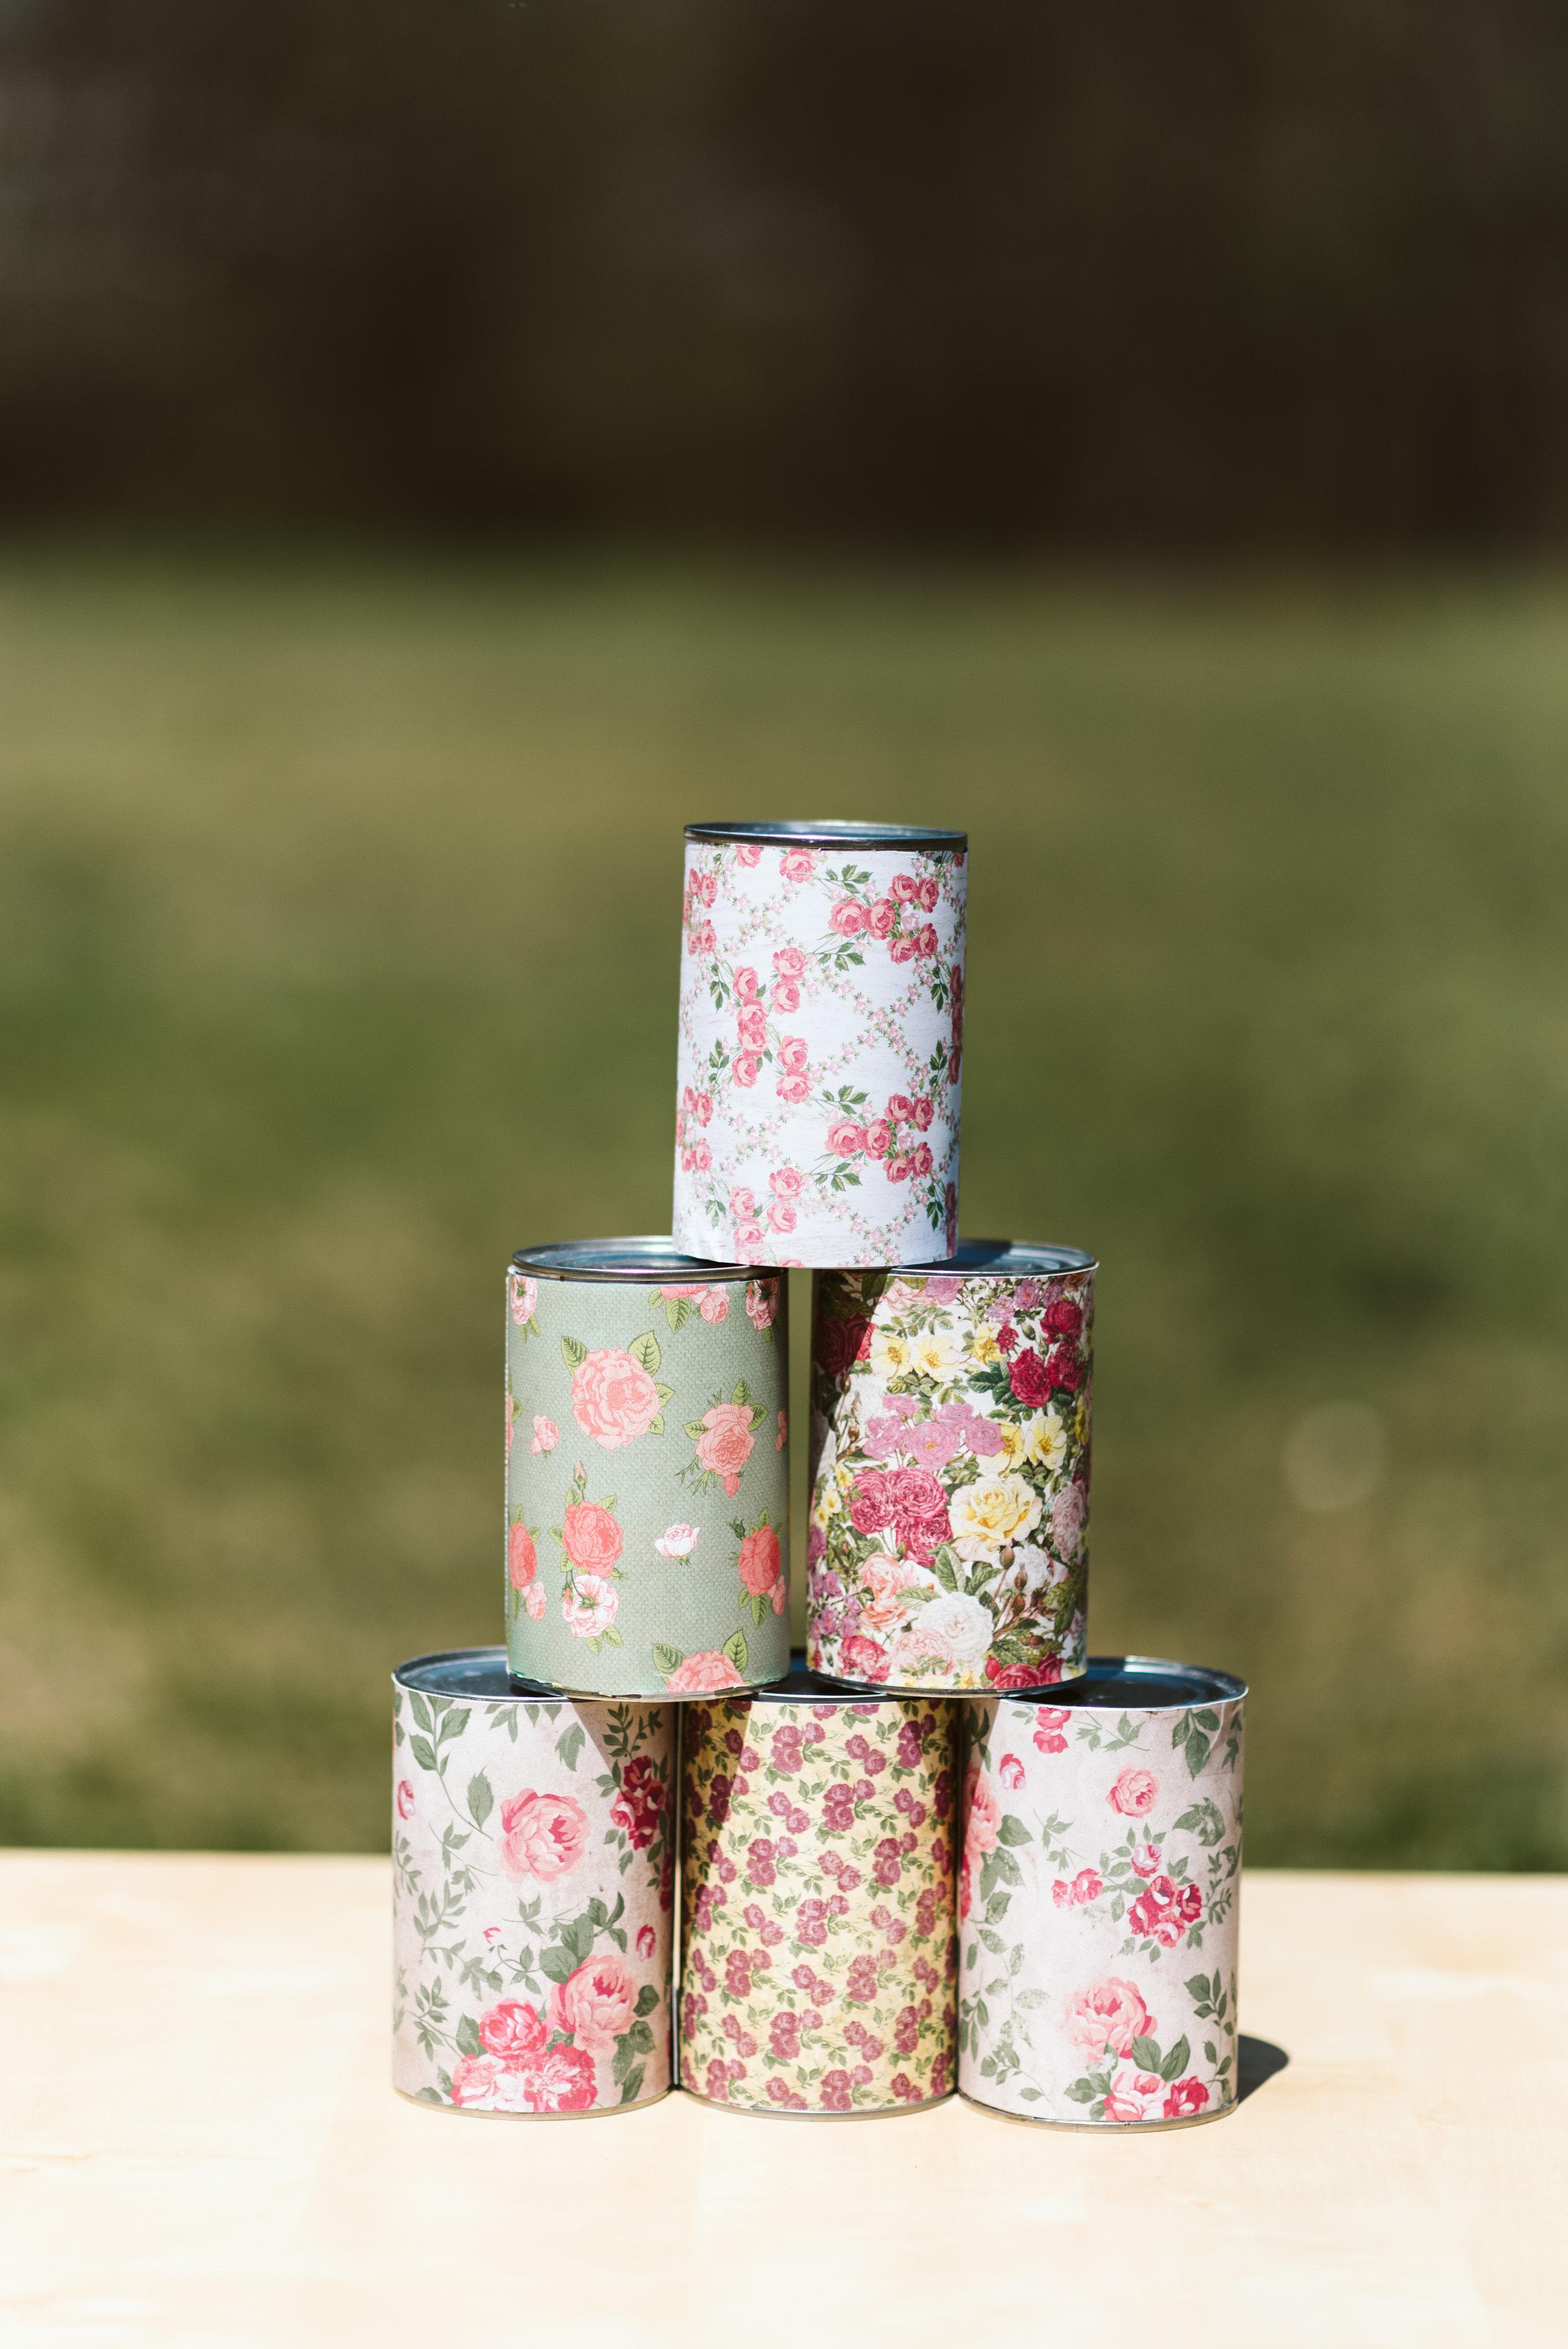 Spring Outdoor Wedding, Park, Baltimore Wedding Photographer, DIY, Classic, Upcycled, Garden Party, Romantic, Handmade Games at Reception